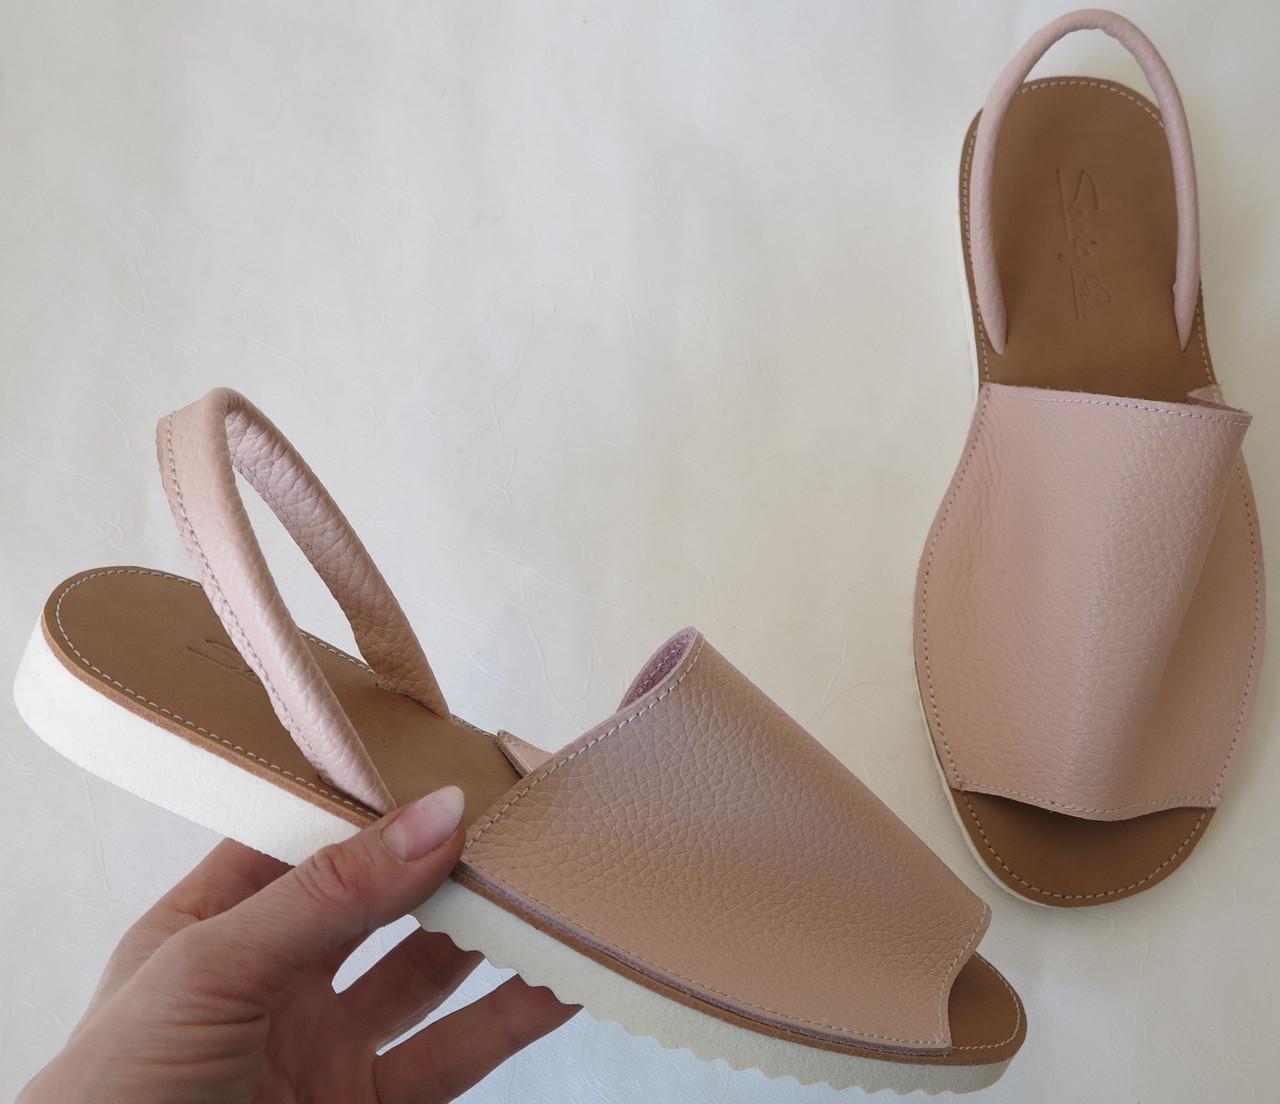 Стиляшки! Женские кожаные сандалии испанка! Летние босоножки менорки цвет пудра